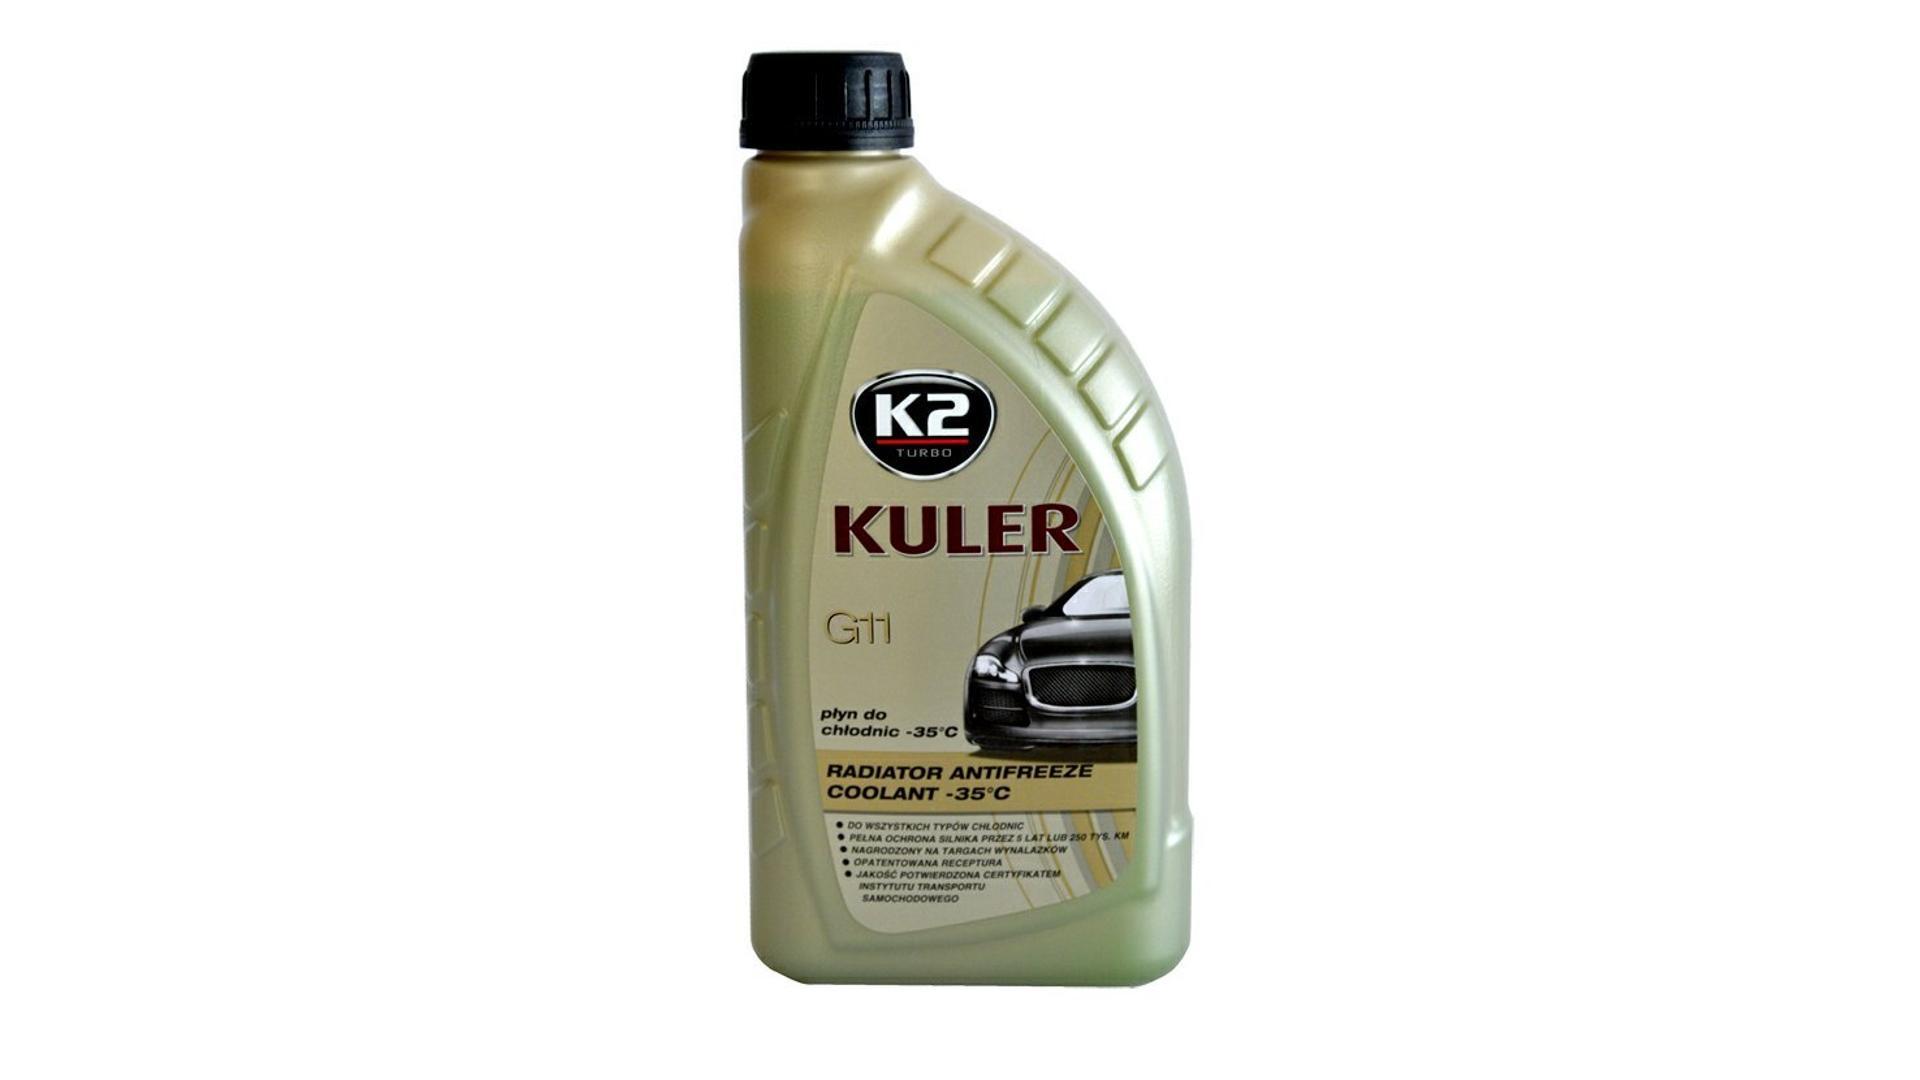 K2 Kuler G11 MODRÁ 1 l - nemrznúca kvapalina do chladiča do -35 ° C